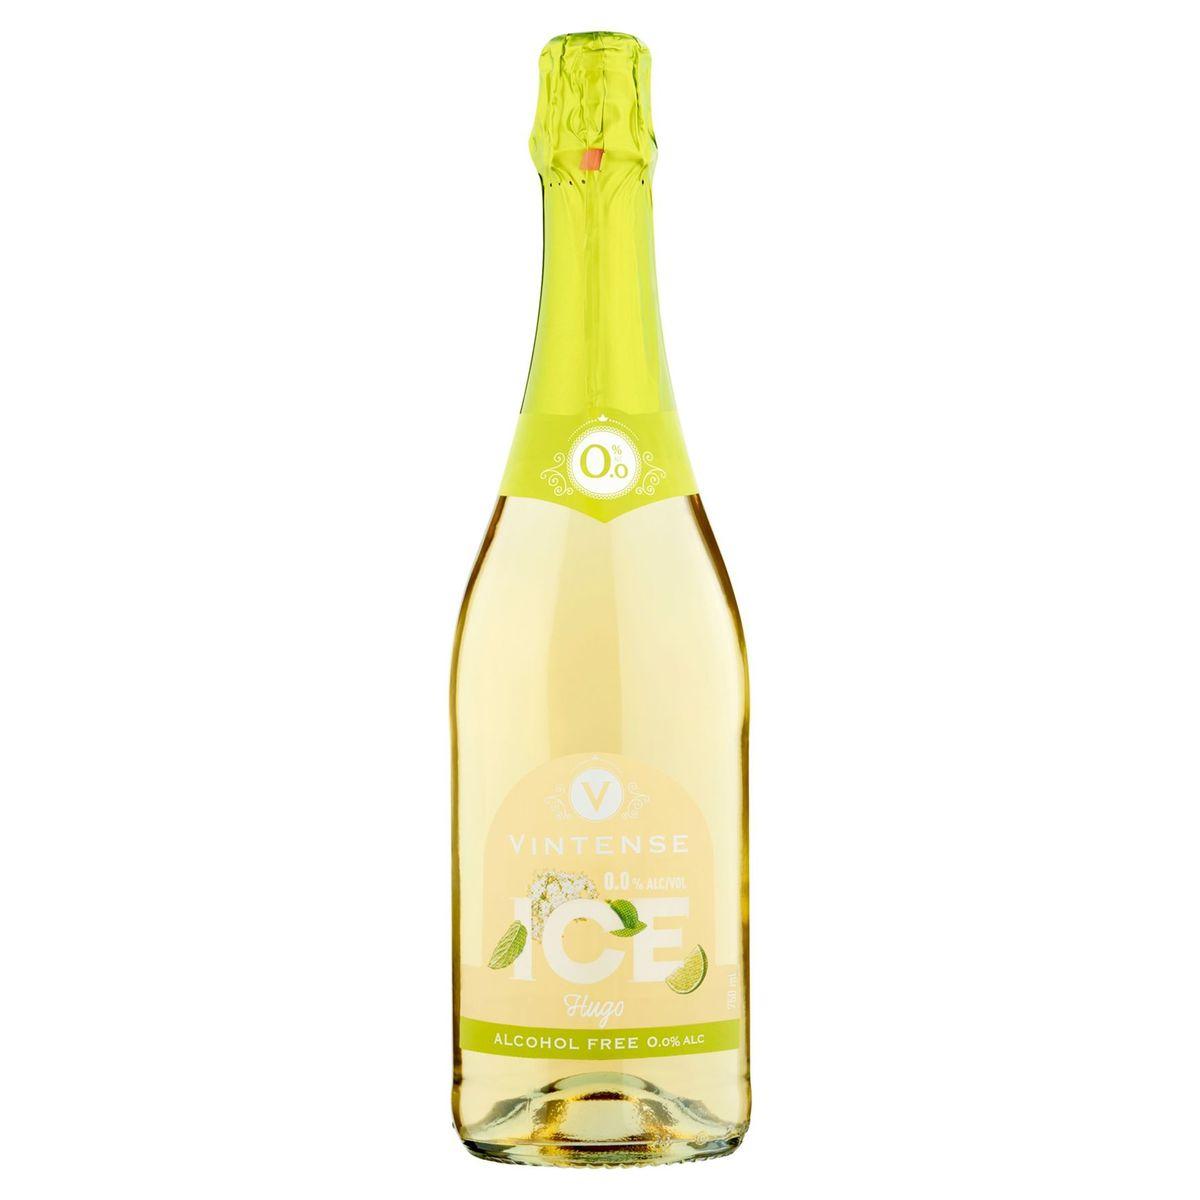 Vintense Ice Hugo 0.0% Alc 750 ml